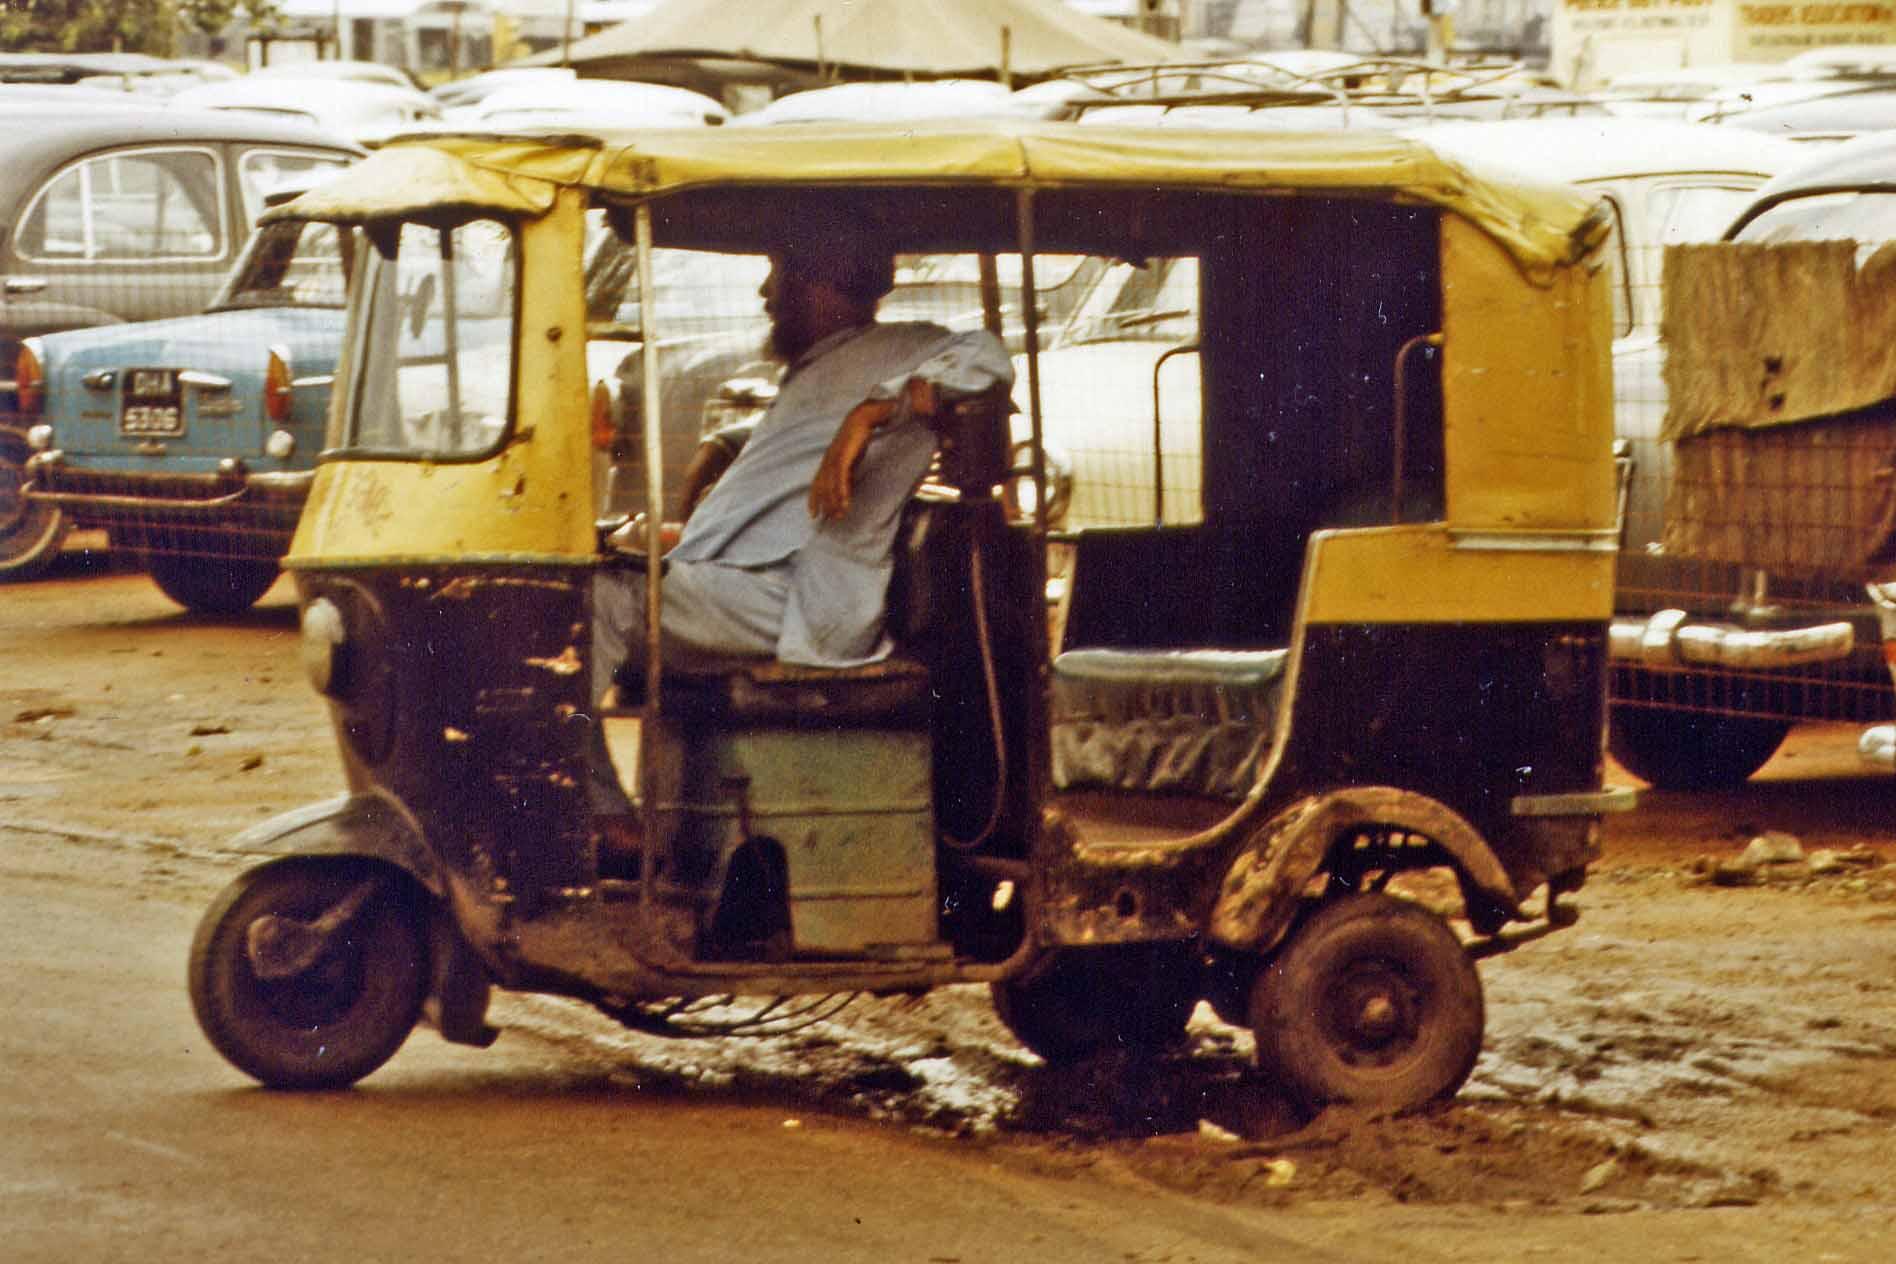 Scooter in New Delhi